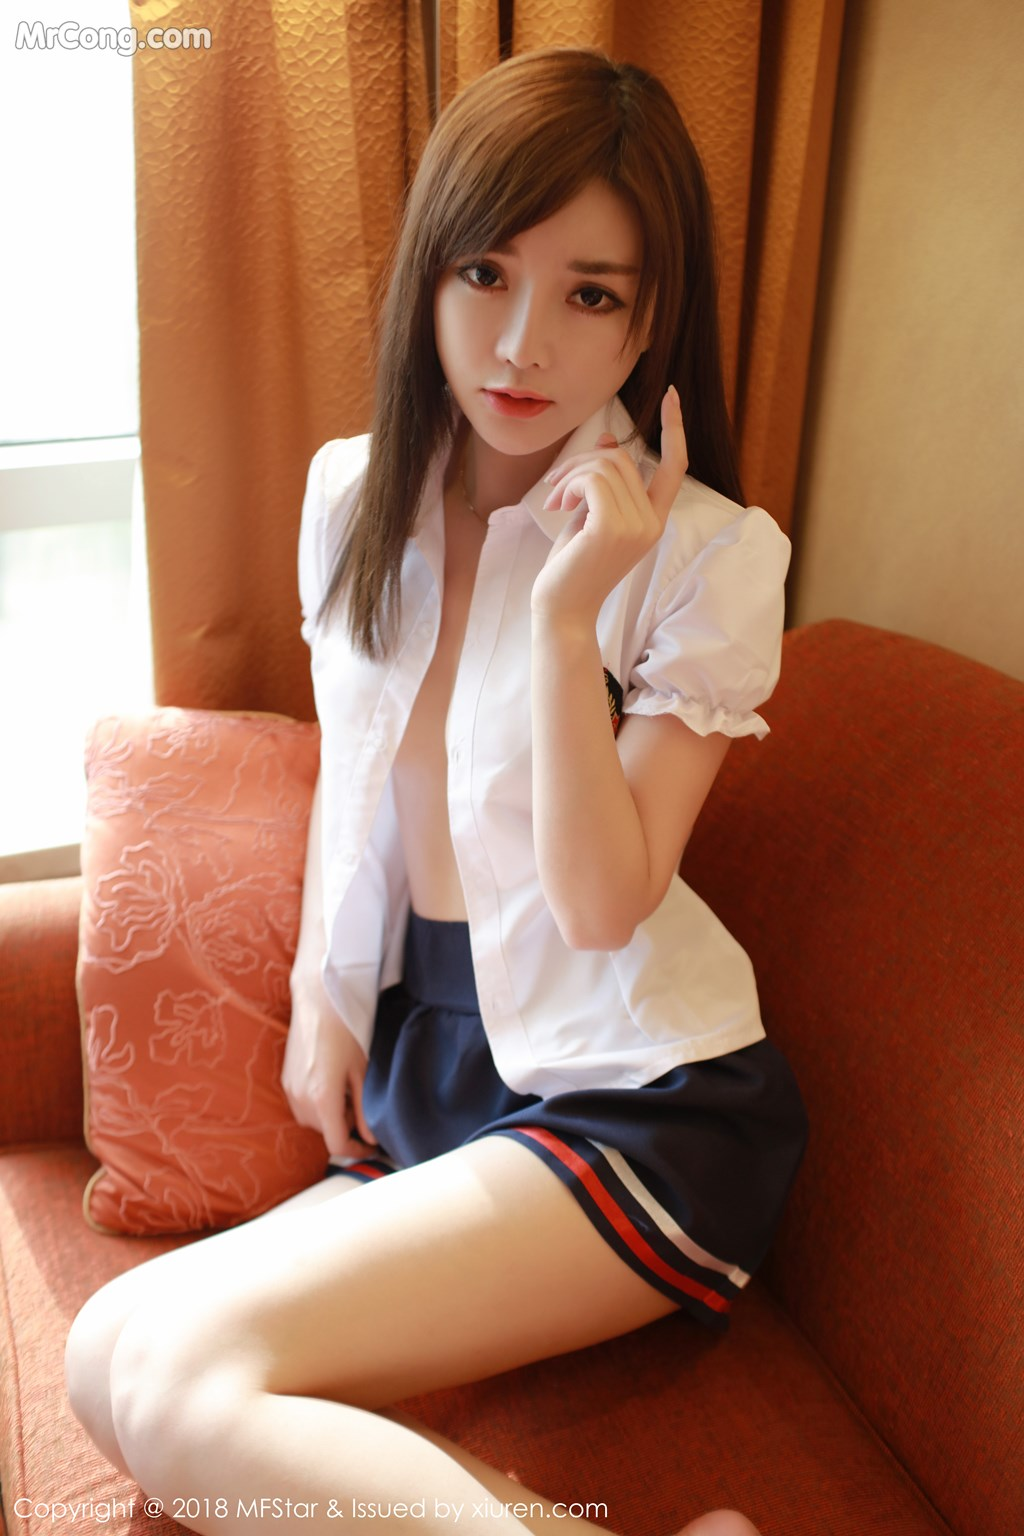 Image MFStar-Vol.146-Han-Zi-Xuan-mm-MrCong.com-008 in post MFStar Vol.146: Người mẫu Han Zi Xuan (韩子萱mm) (37 ảnh)